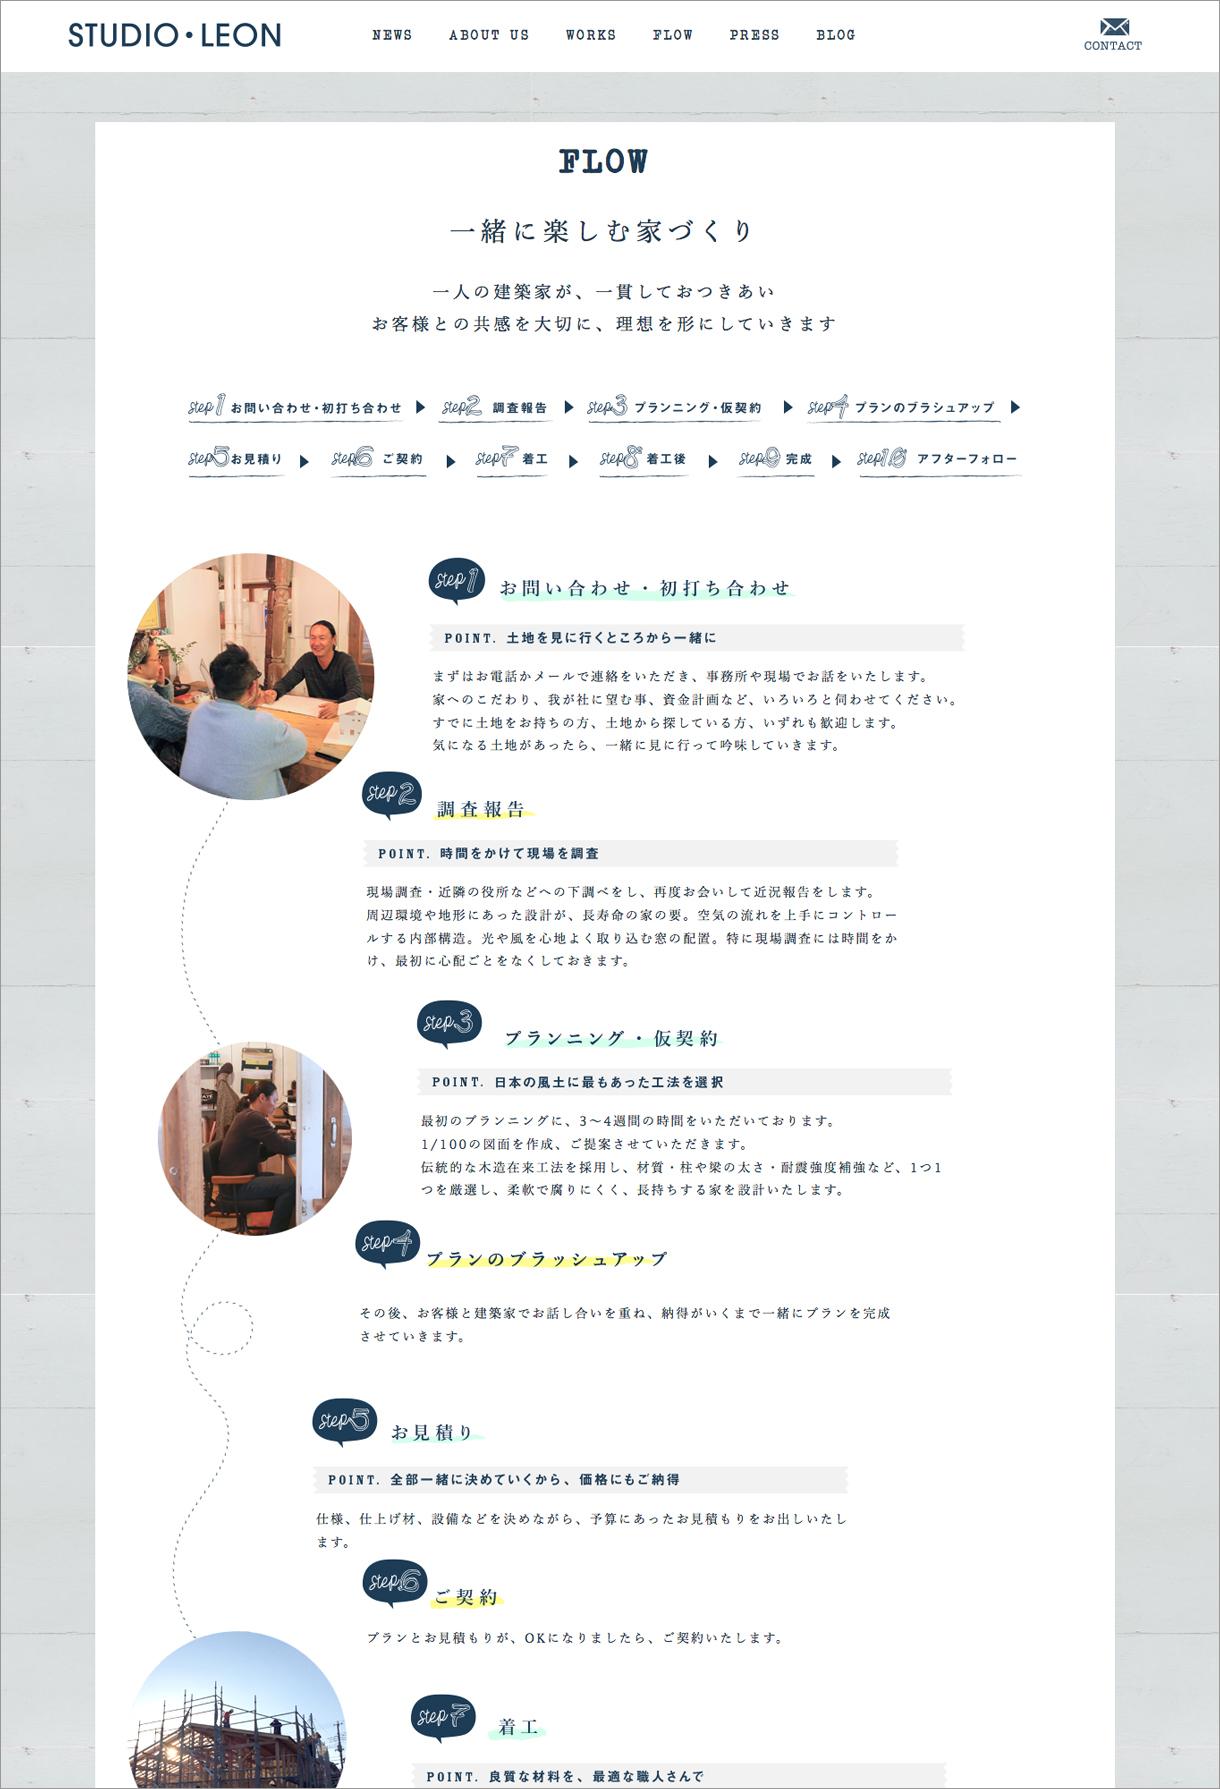 有限会社 STUDIO・LEON